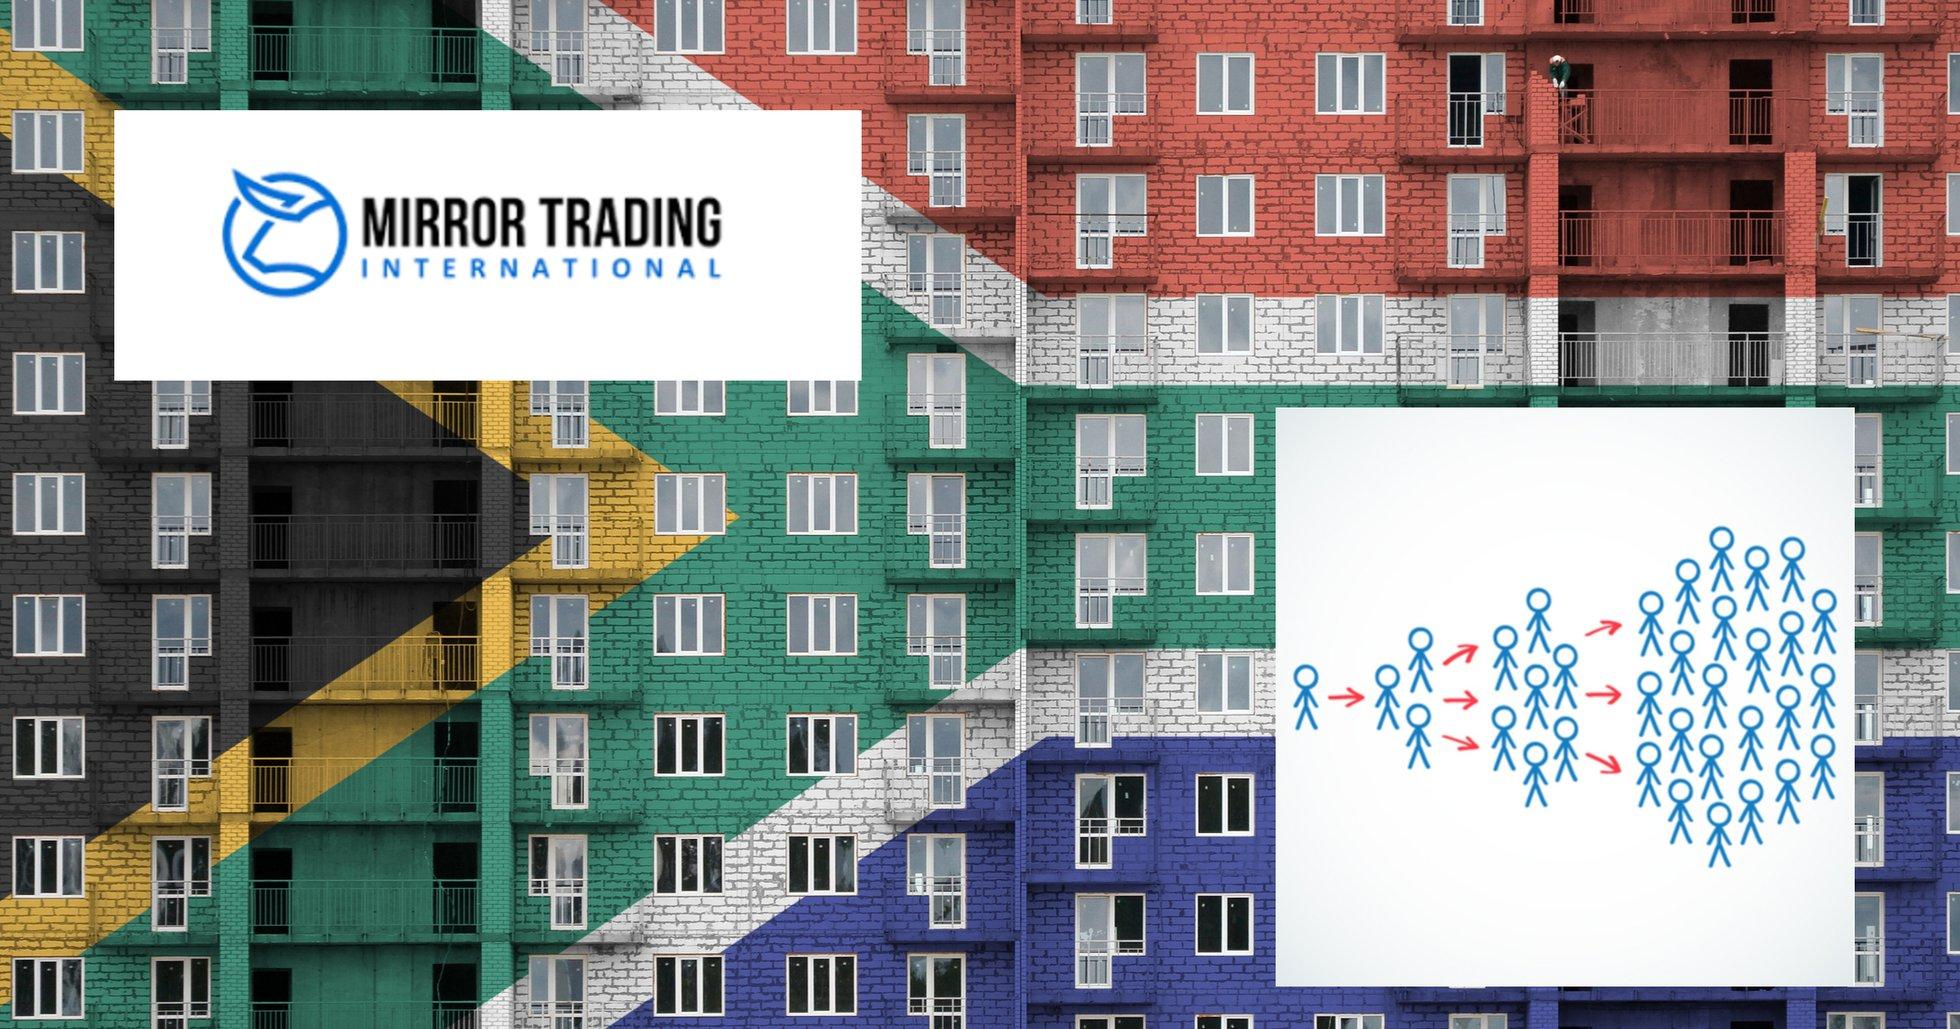 Warning issued against suspected MLM fraud Mirror Trading International.